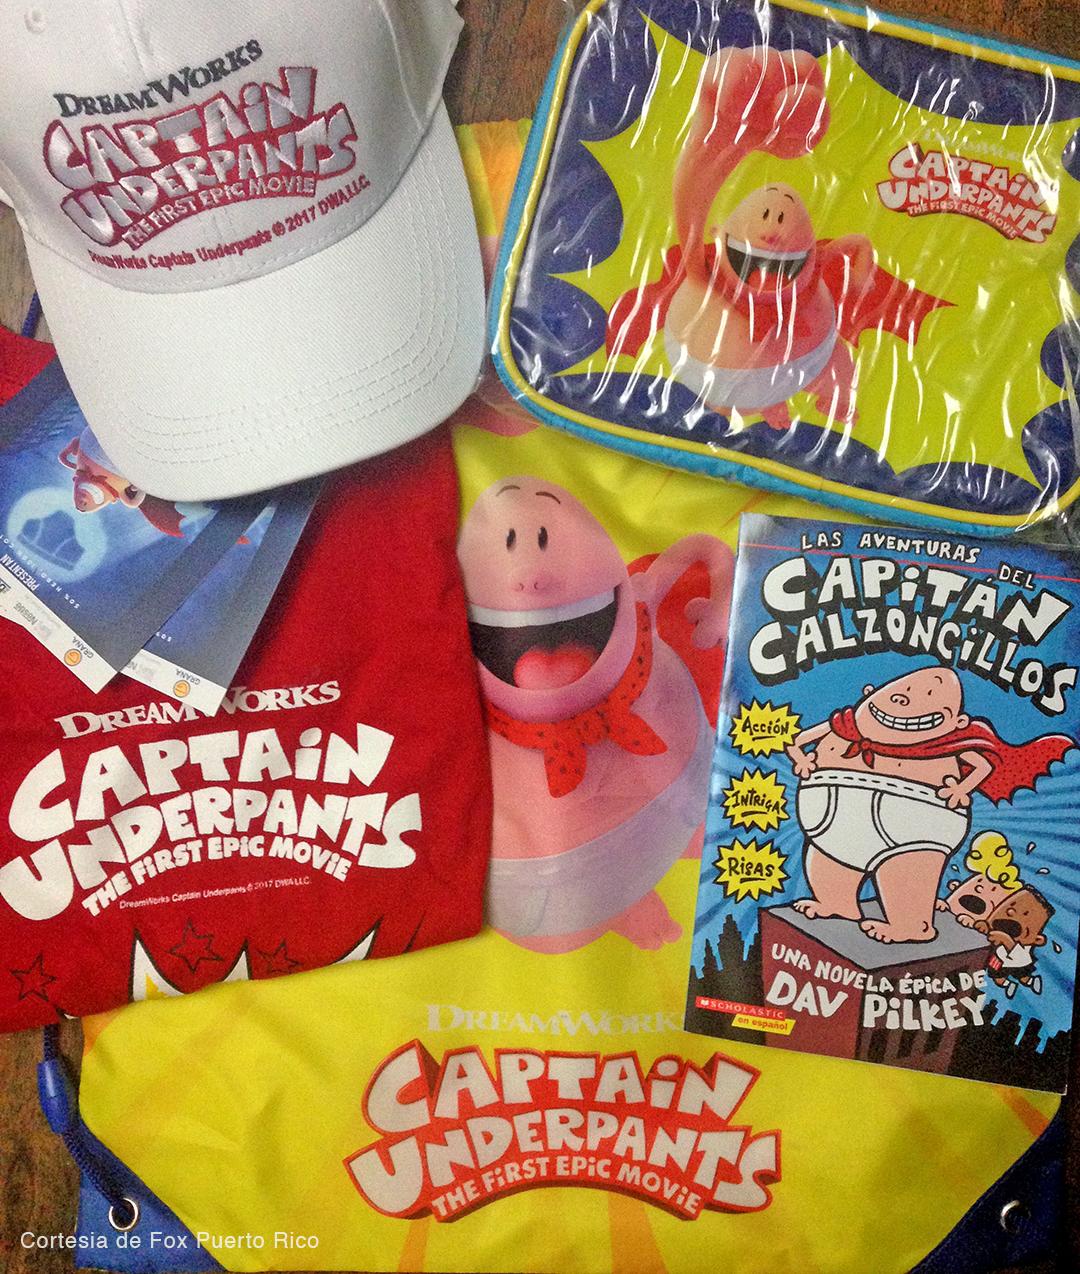 Captain Underpants winner